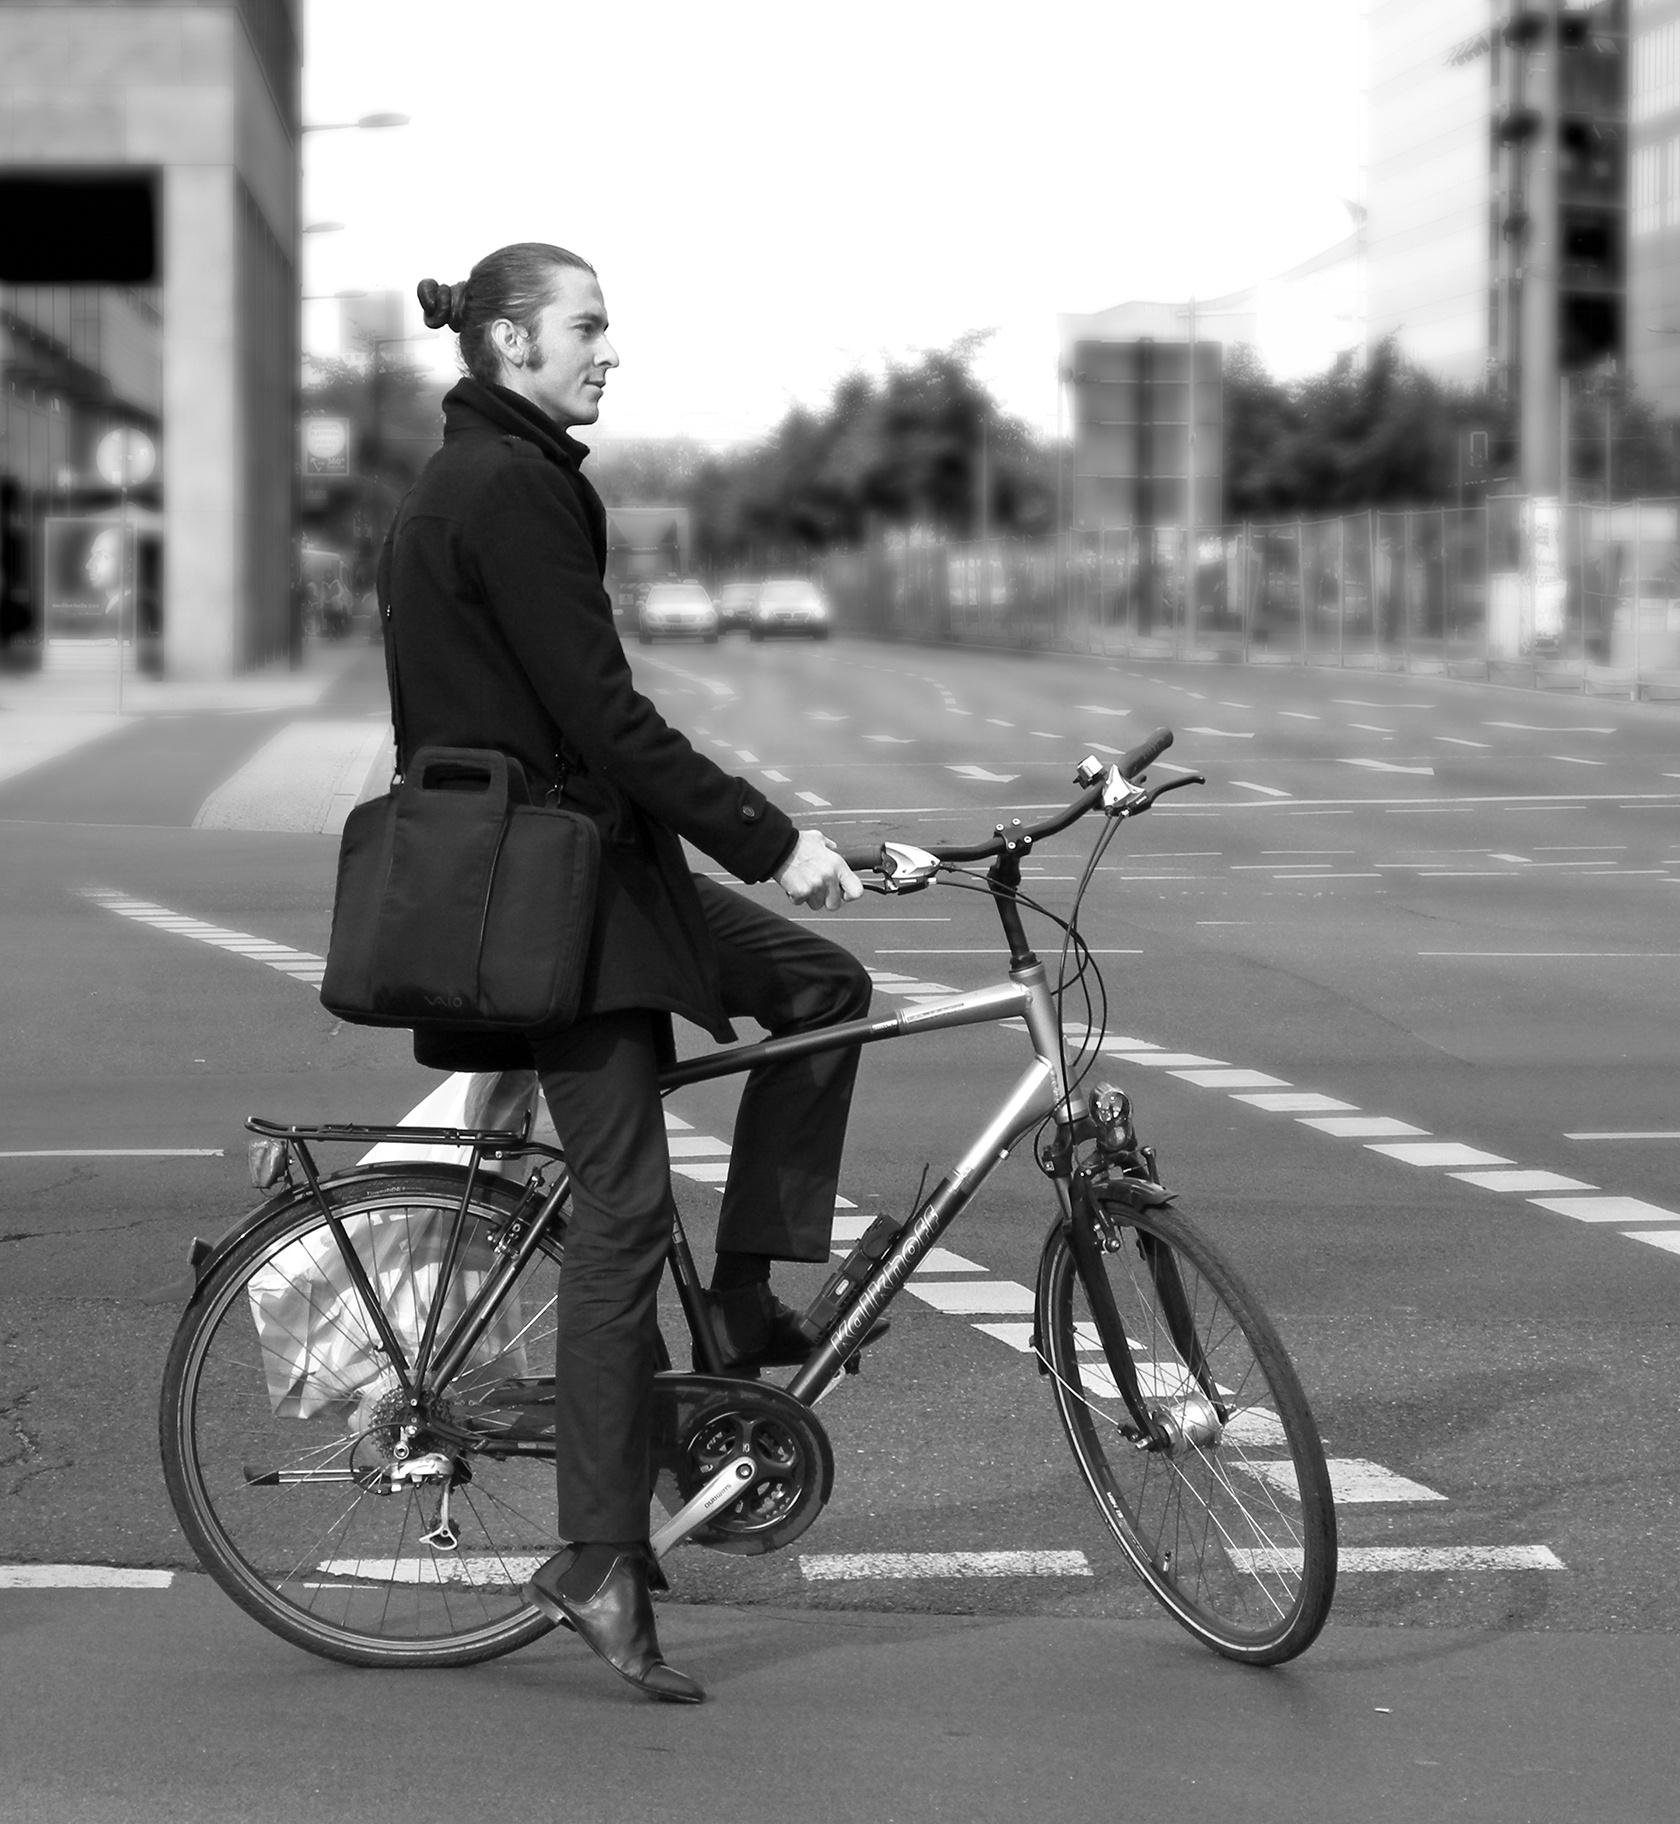 Berlín 2011 (D) - Street-b&w - Urbano Suárez,  FineArt Photography